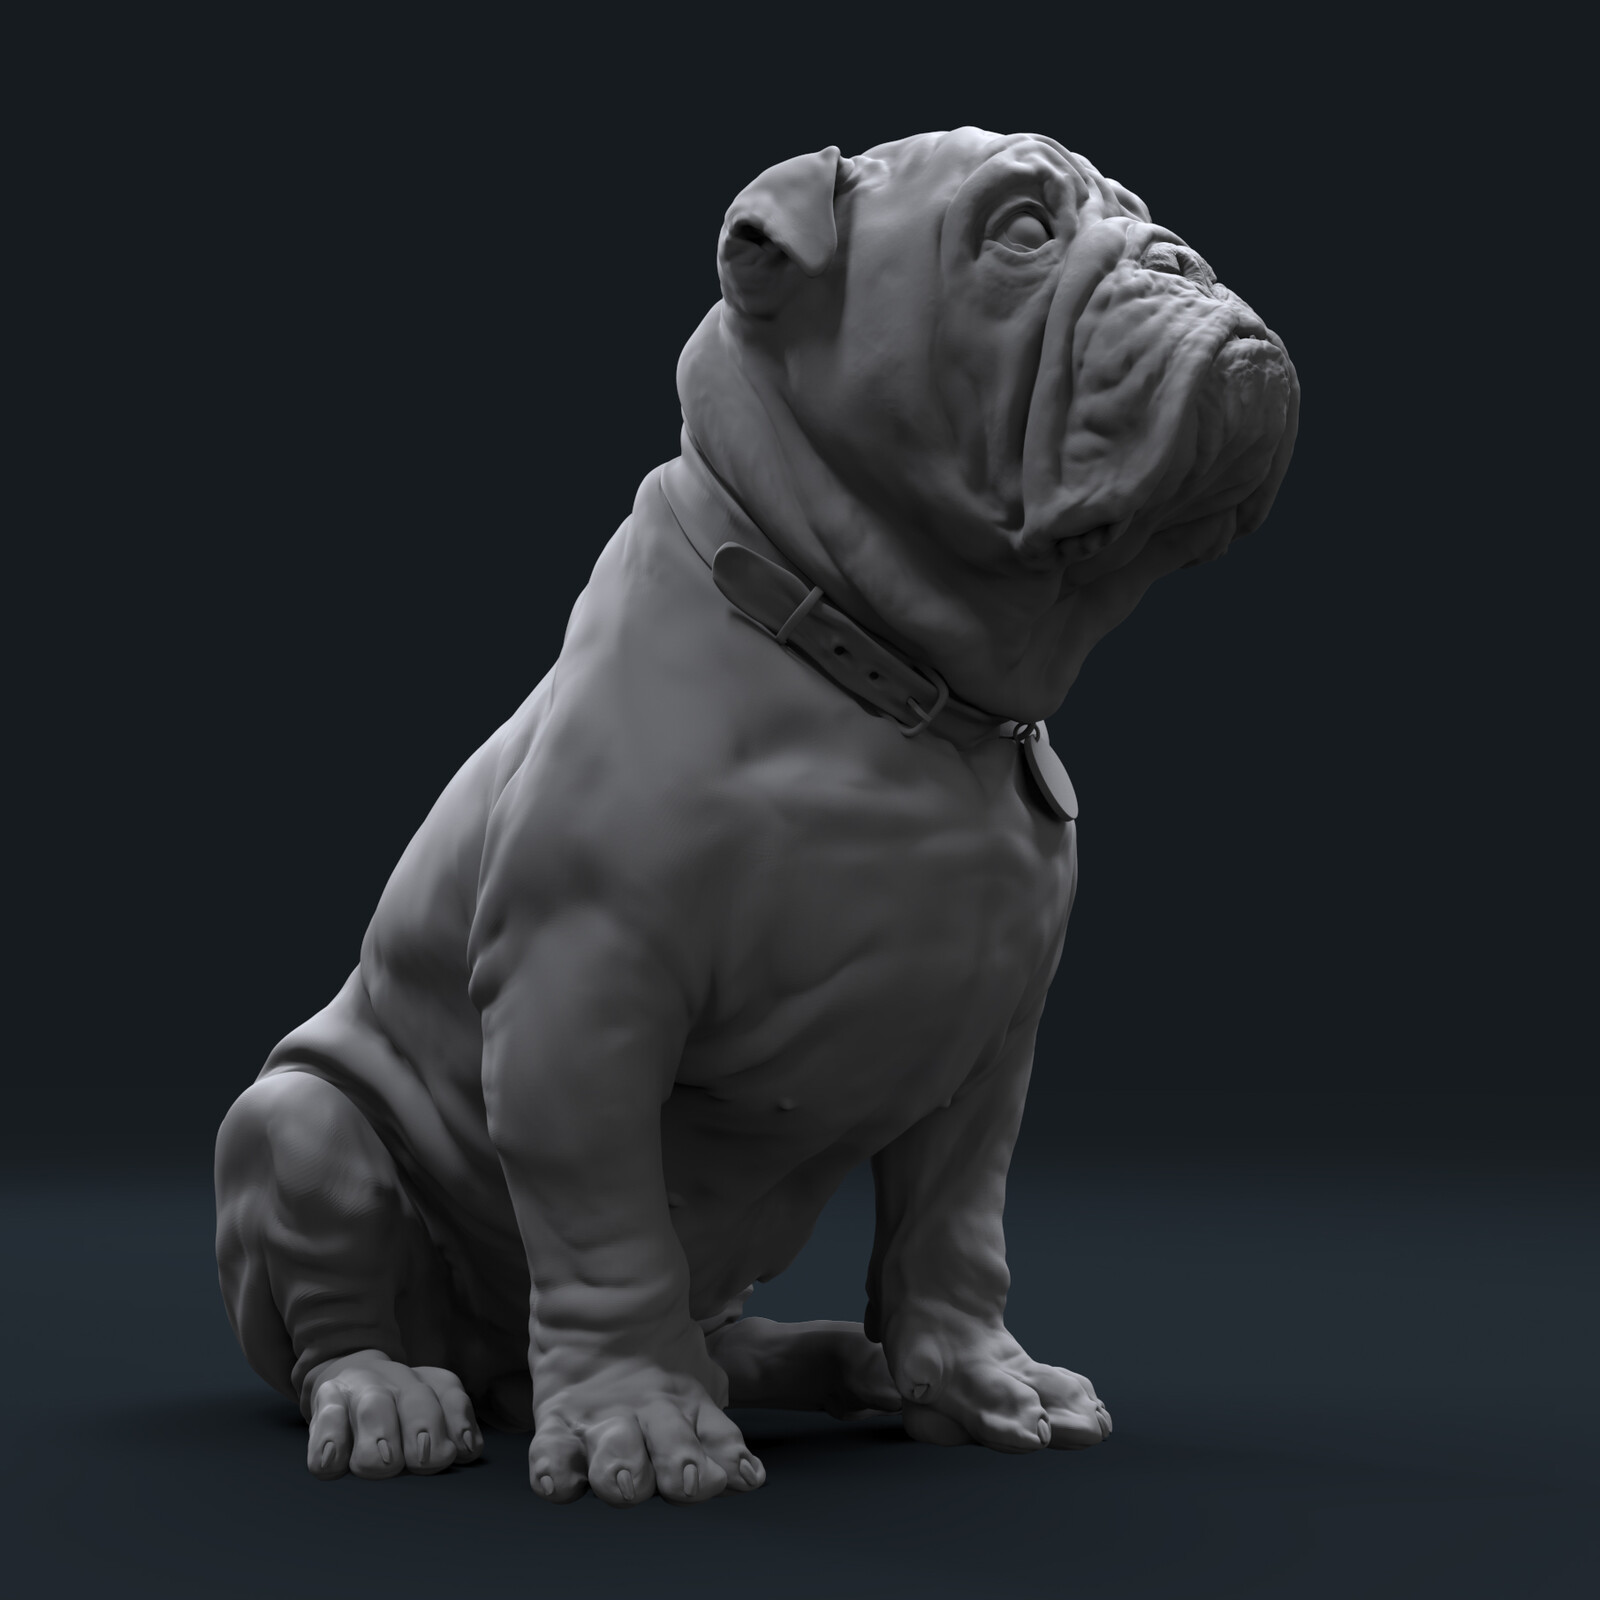 Churchill_dog - Heroic